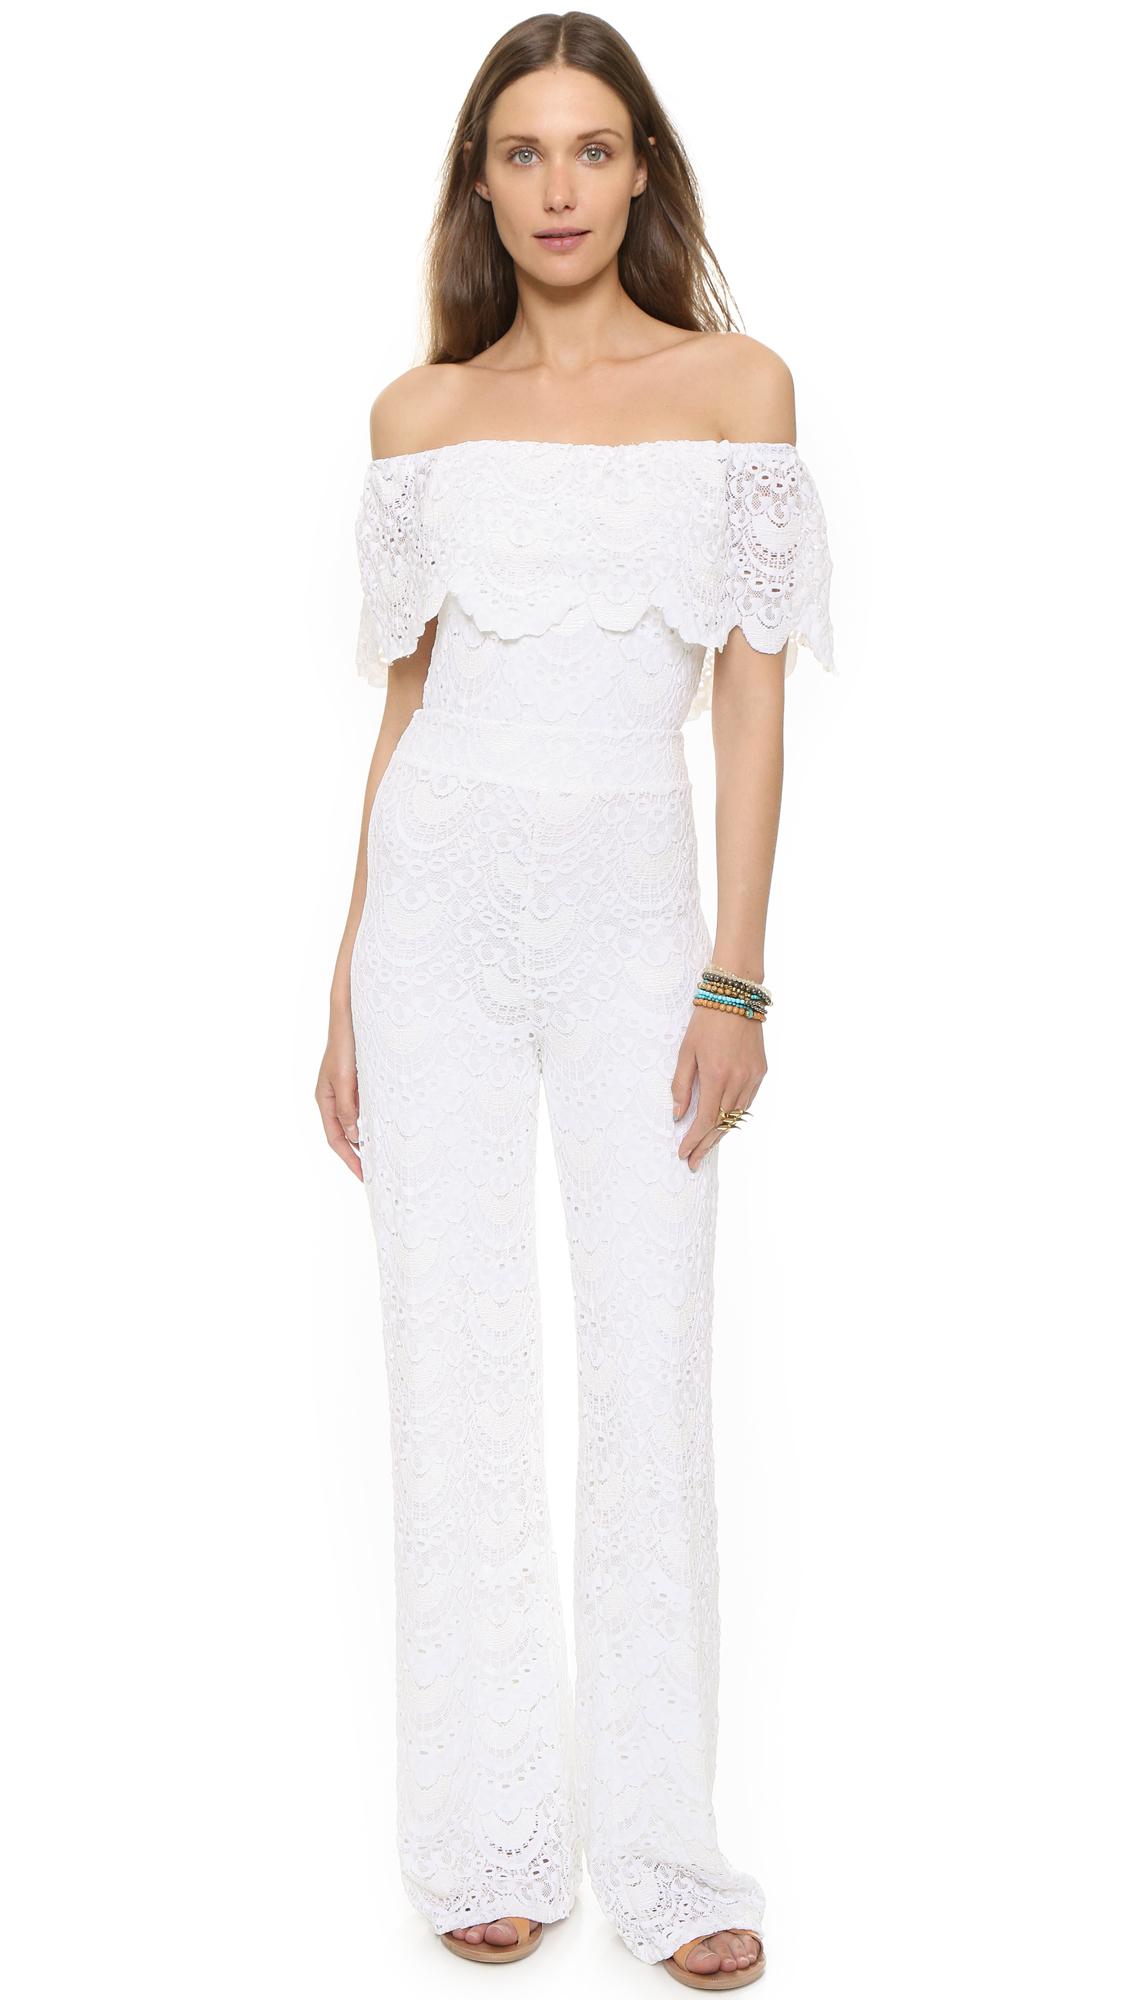 d9dcfd683c Nightcap Positano Jumpsuit - White in White - Lyst